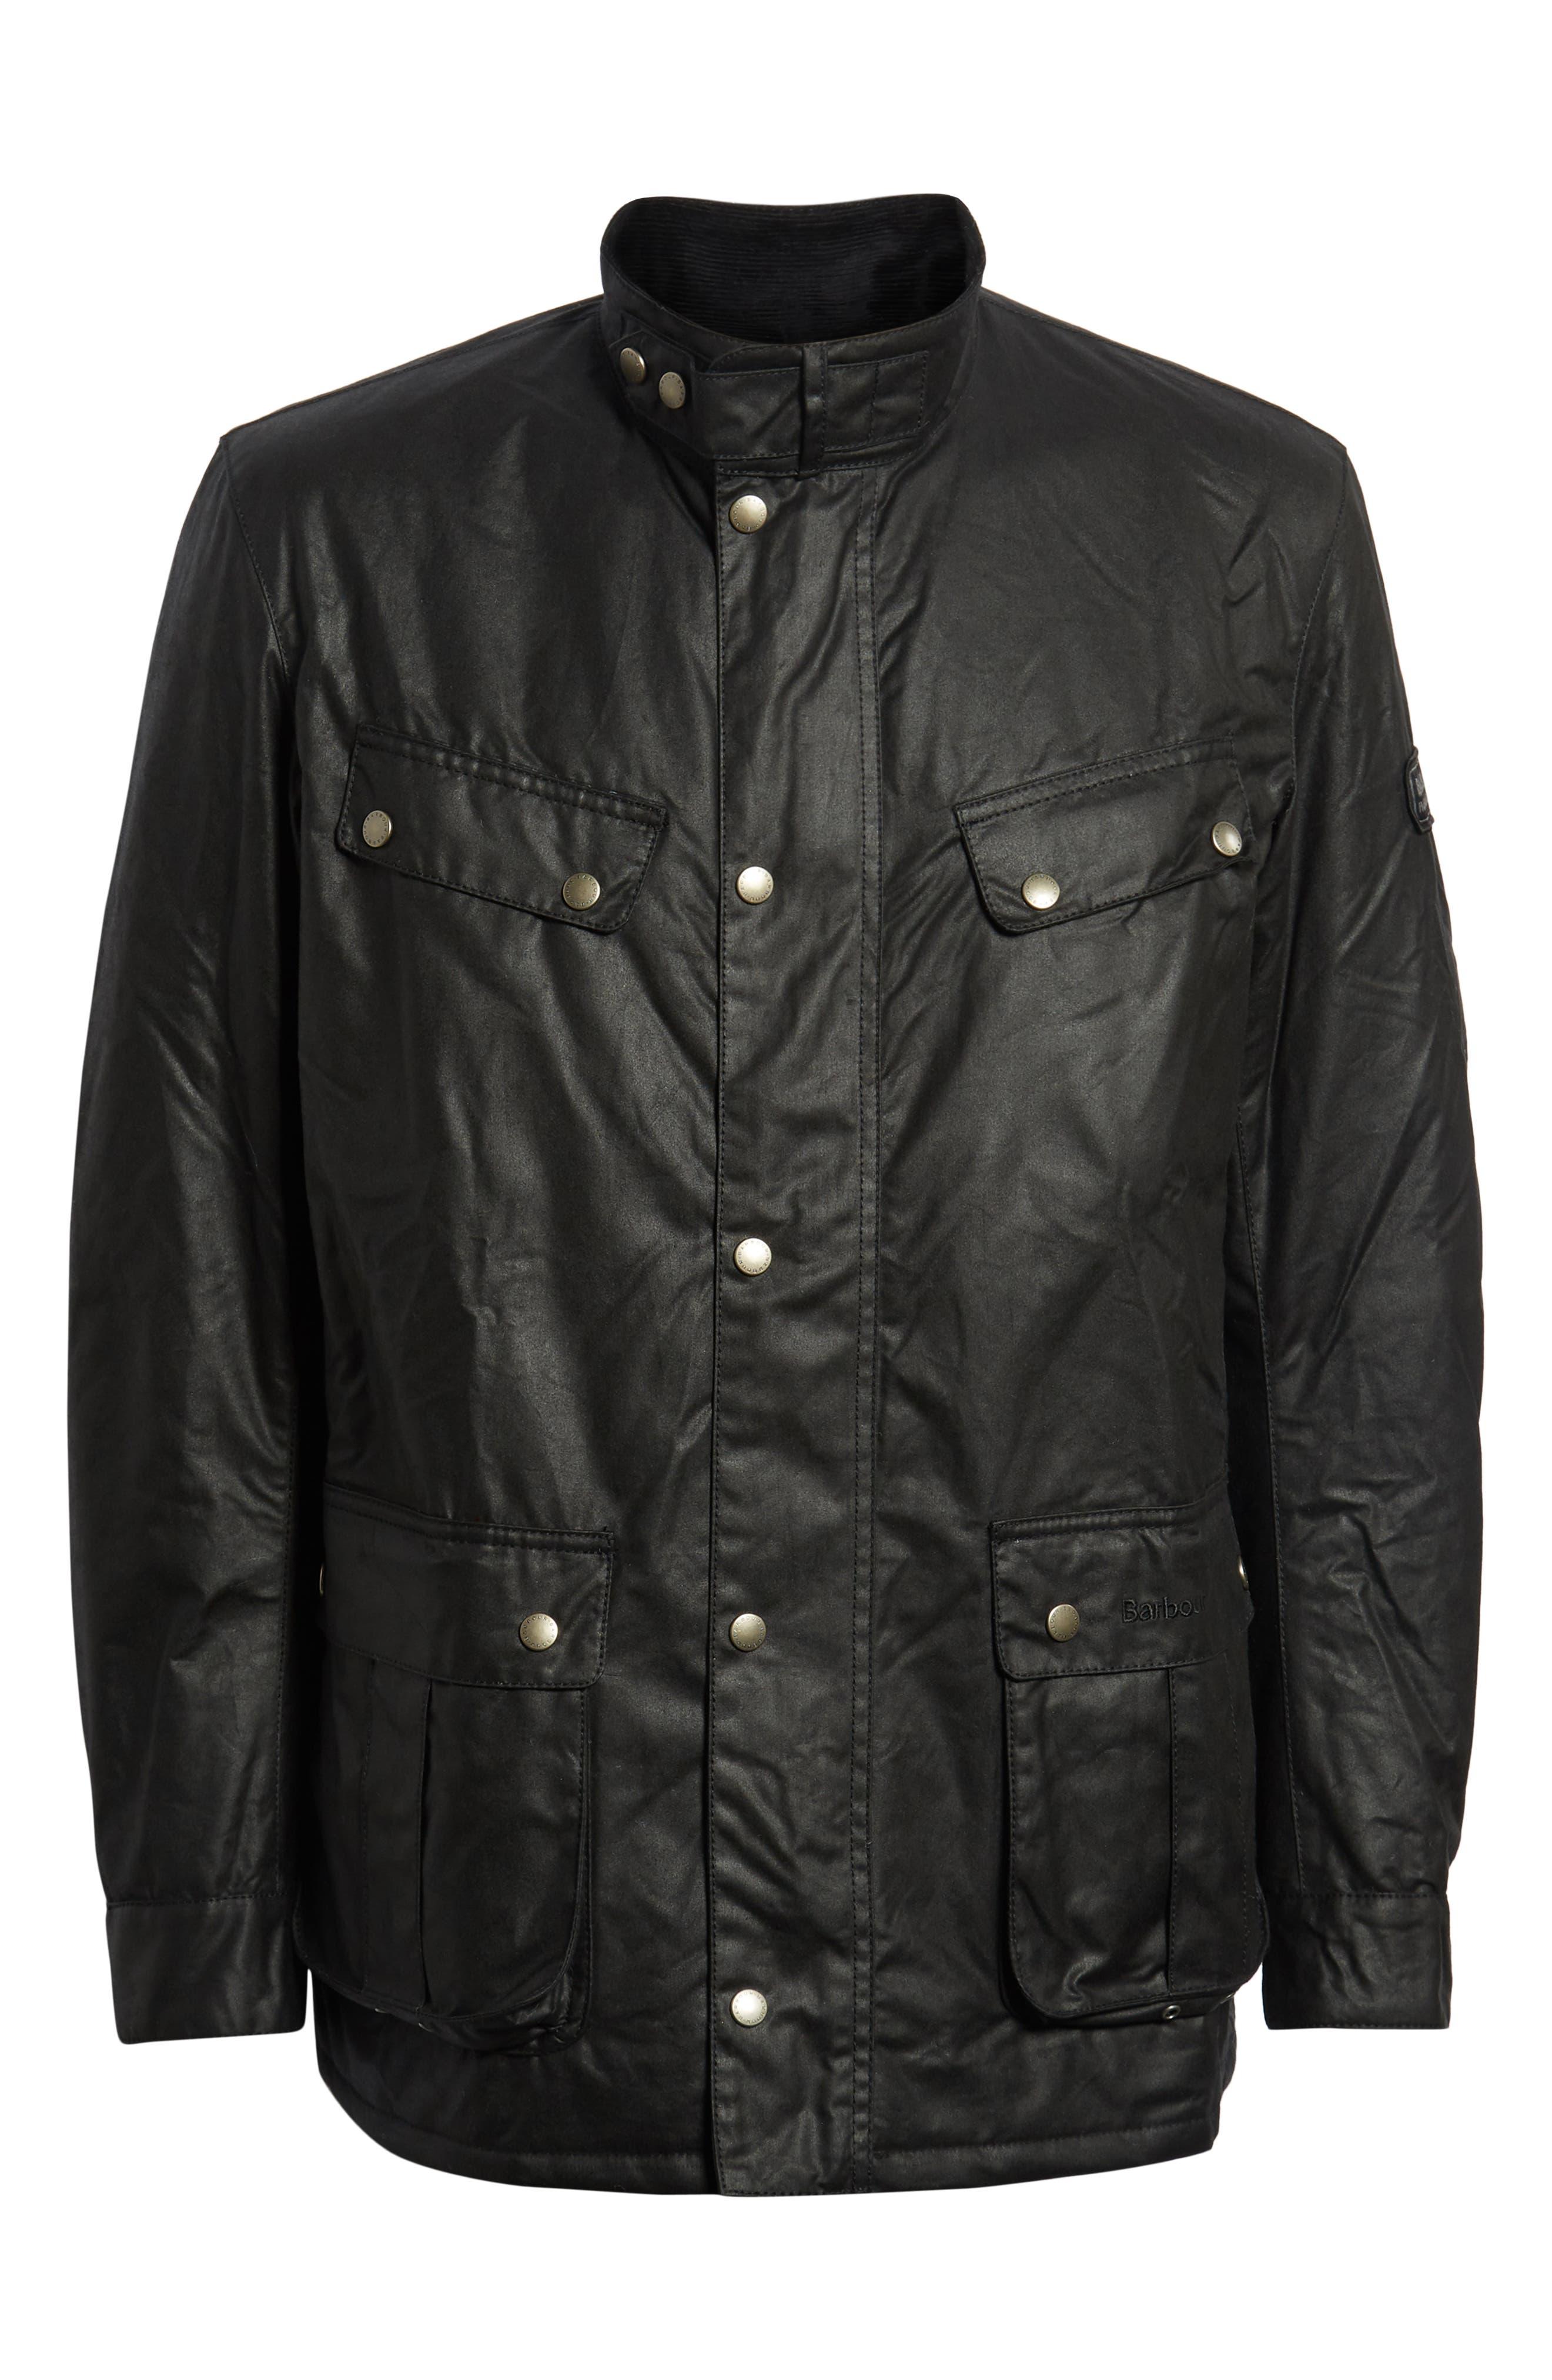 BARBOUR 'Duke' Regular Fit Waterproof Waxed Cotton Jacket, Main, color, BLACK